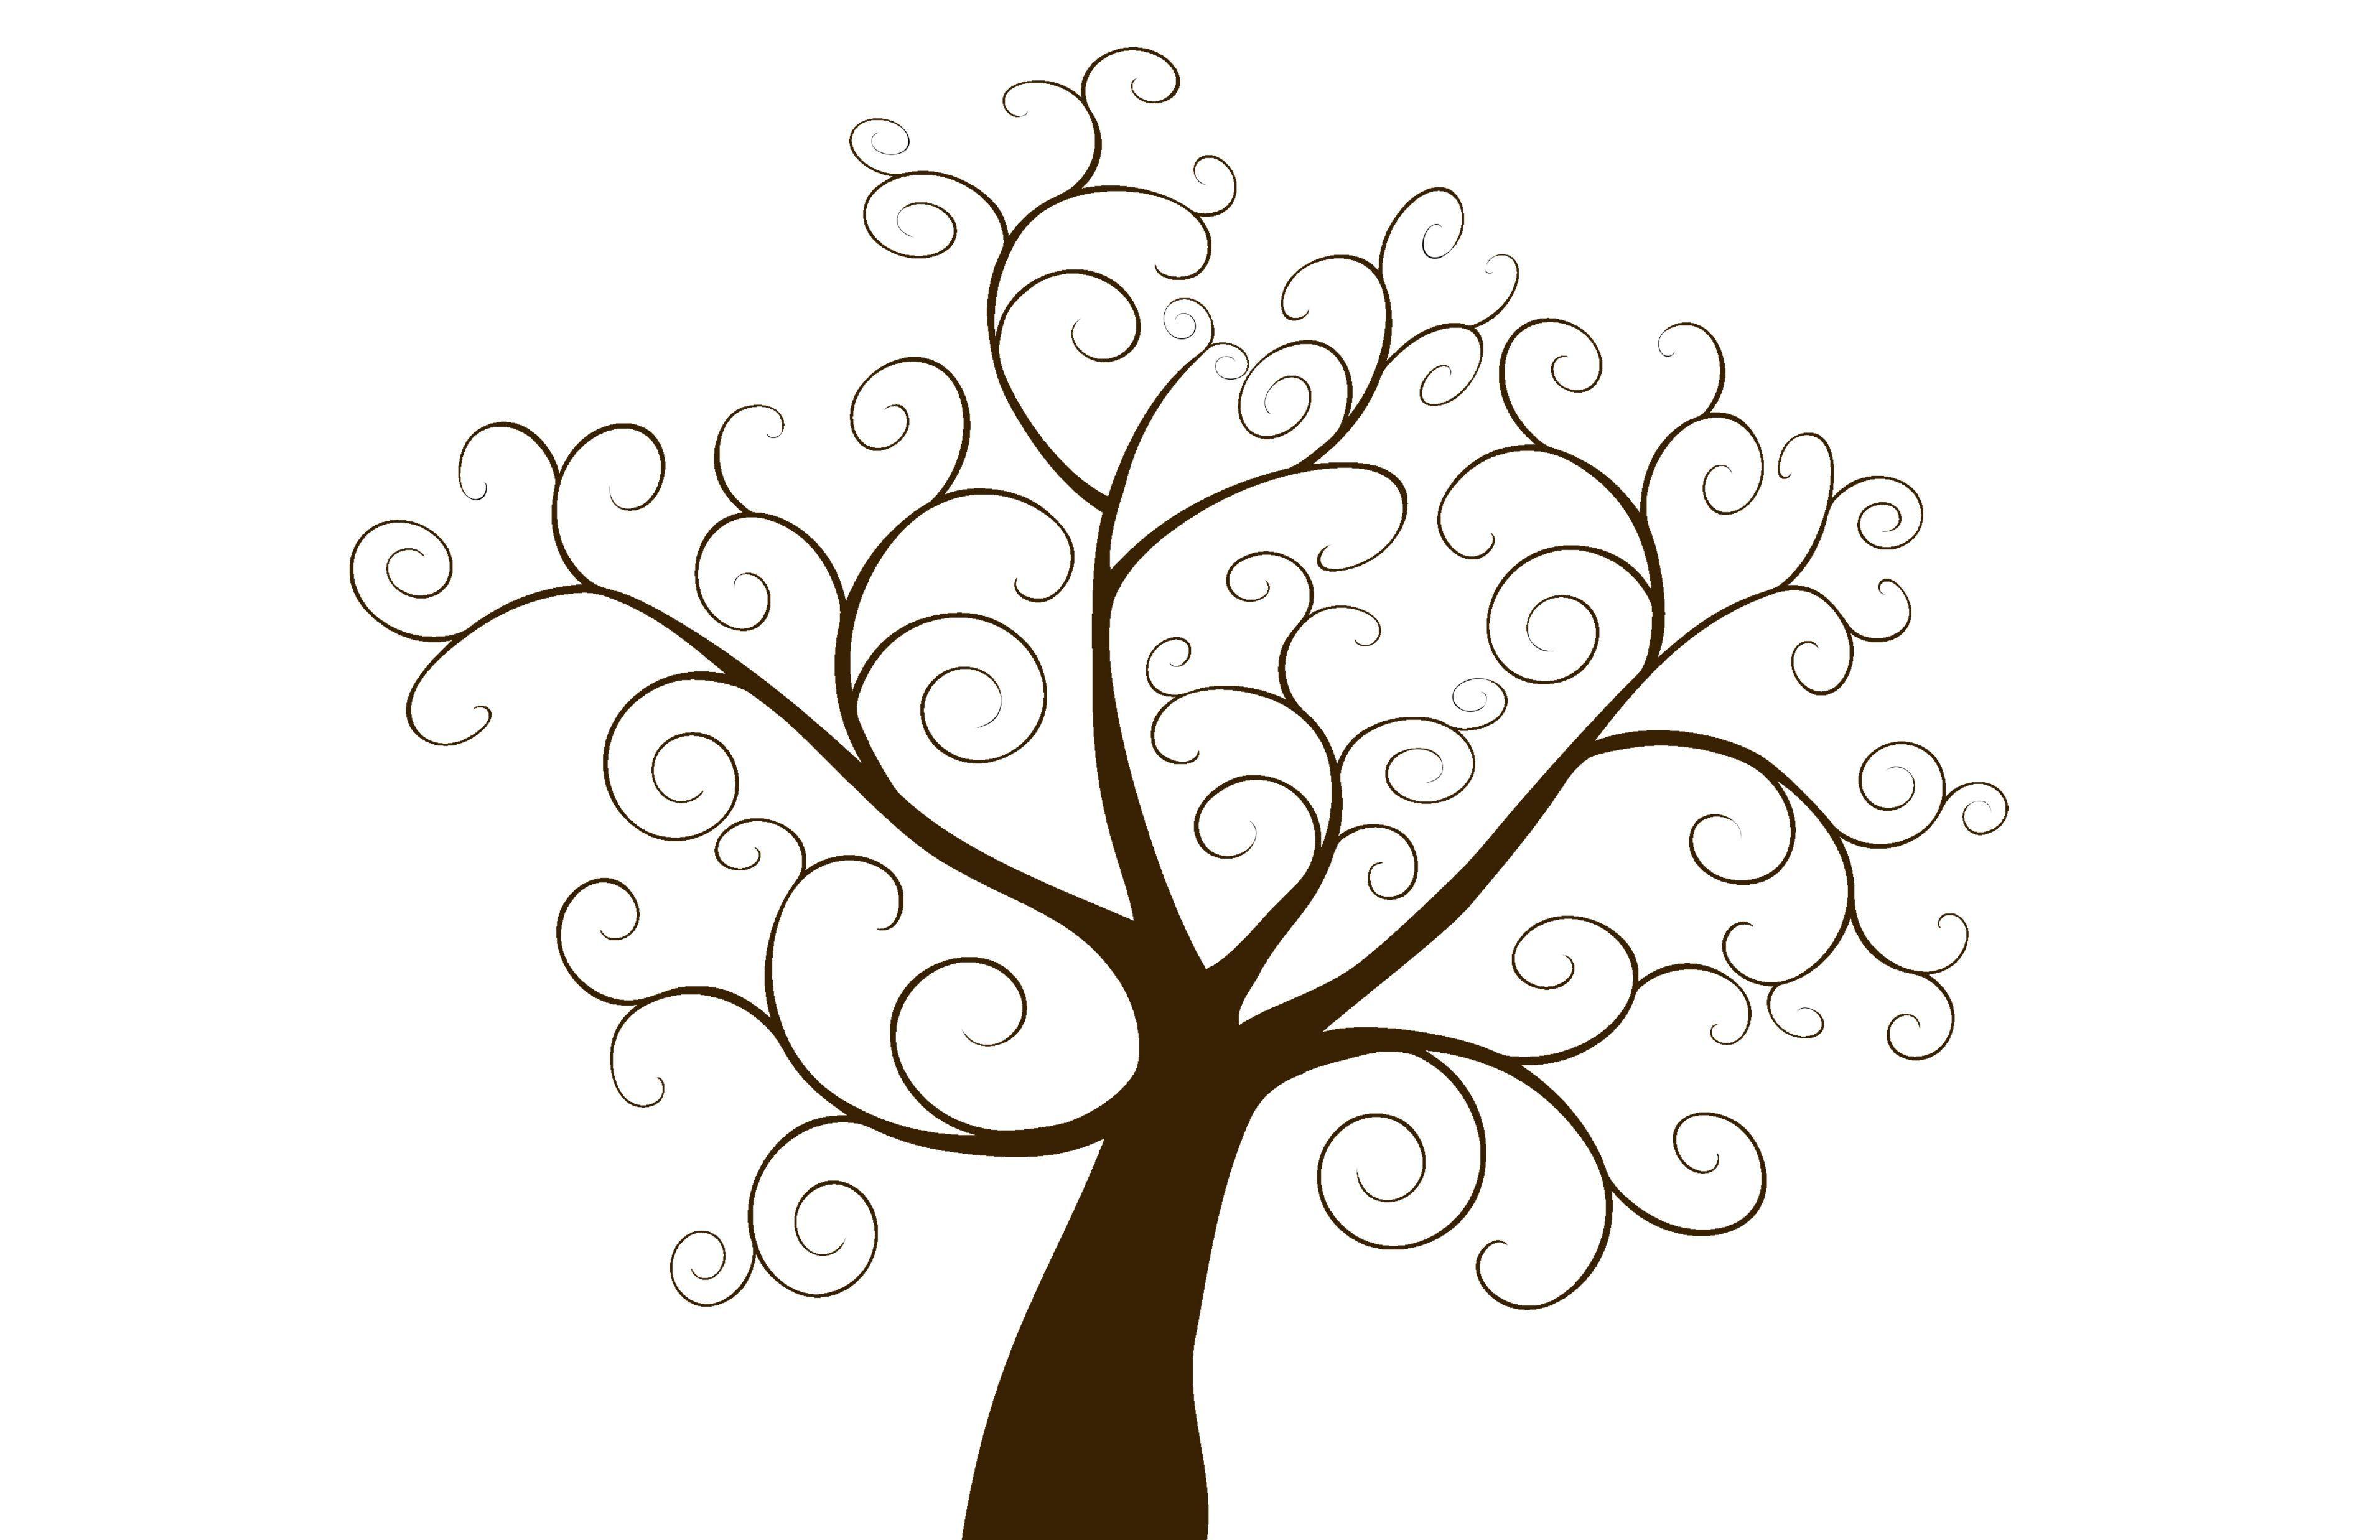 Fingerprint Tree And Sign Weddingbee Diy Projects.